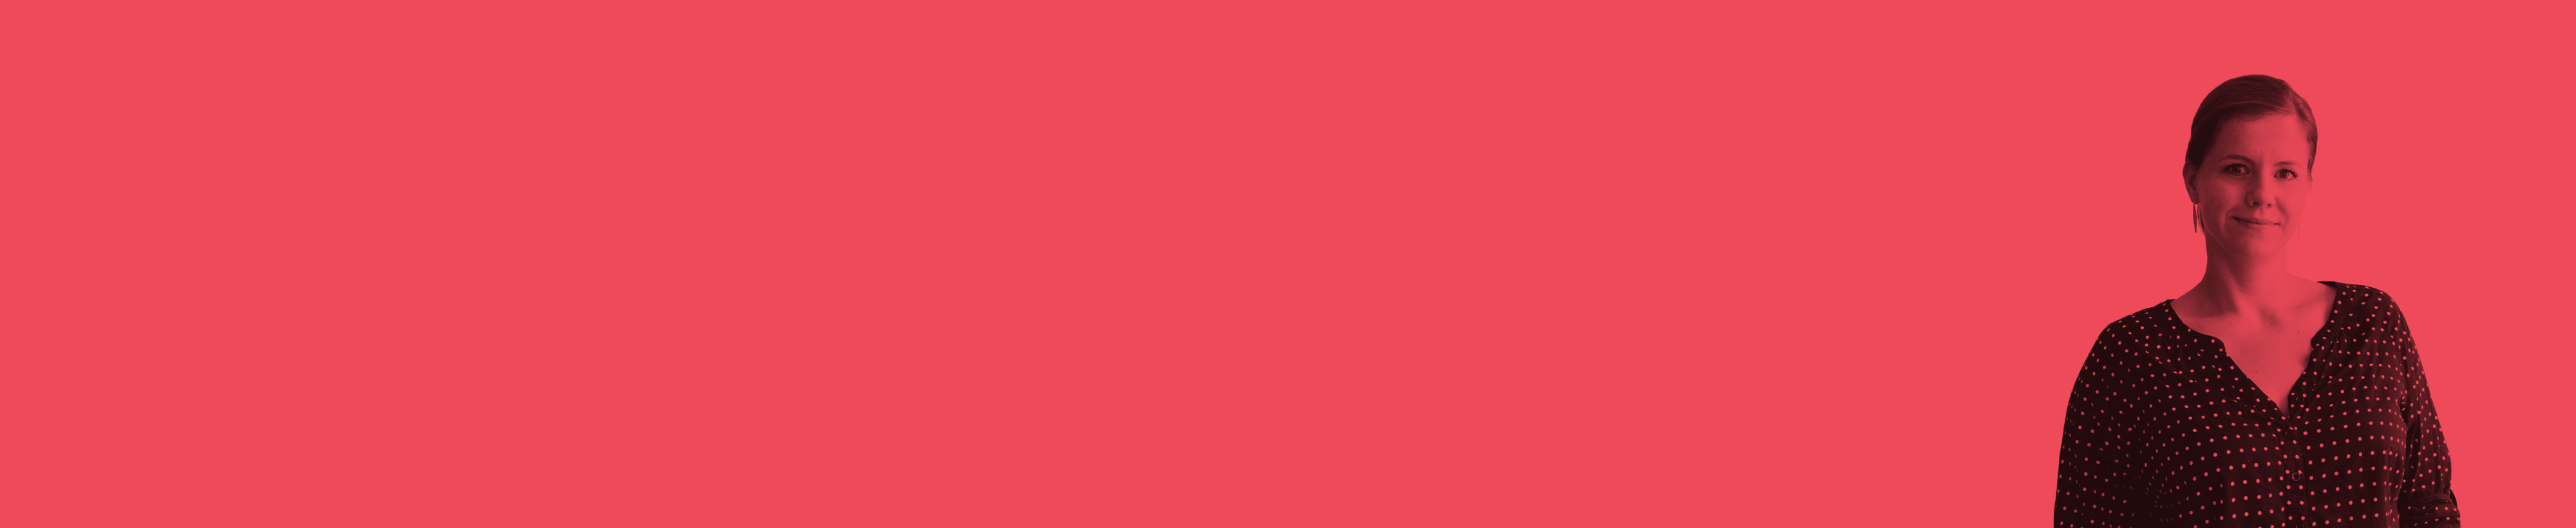 dlc-daike-martens-farbe-1